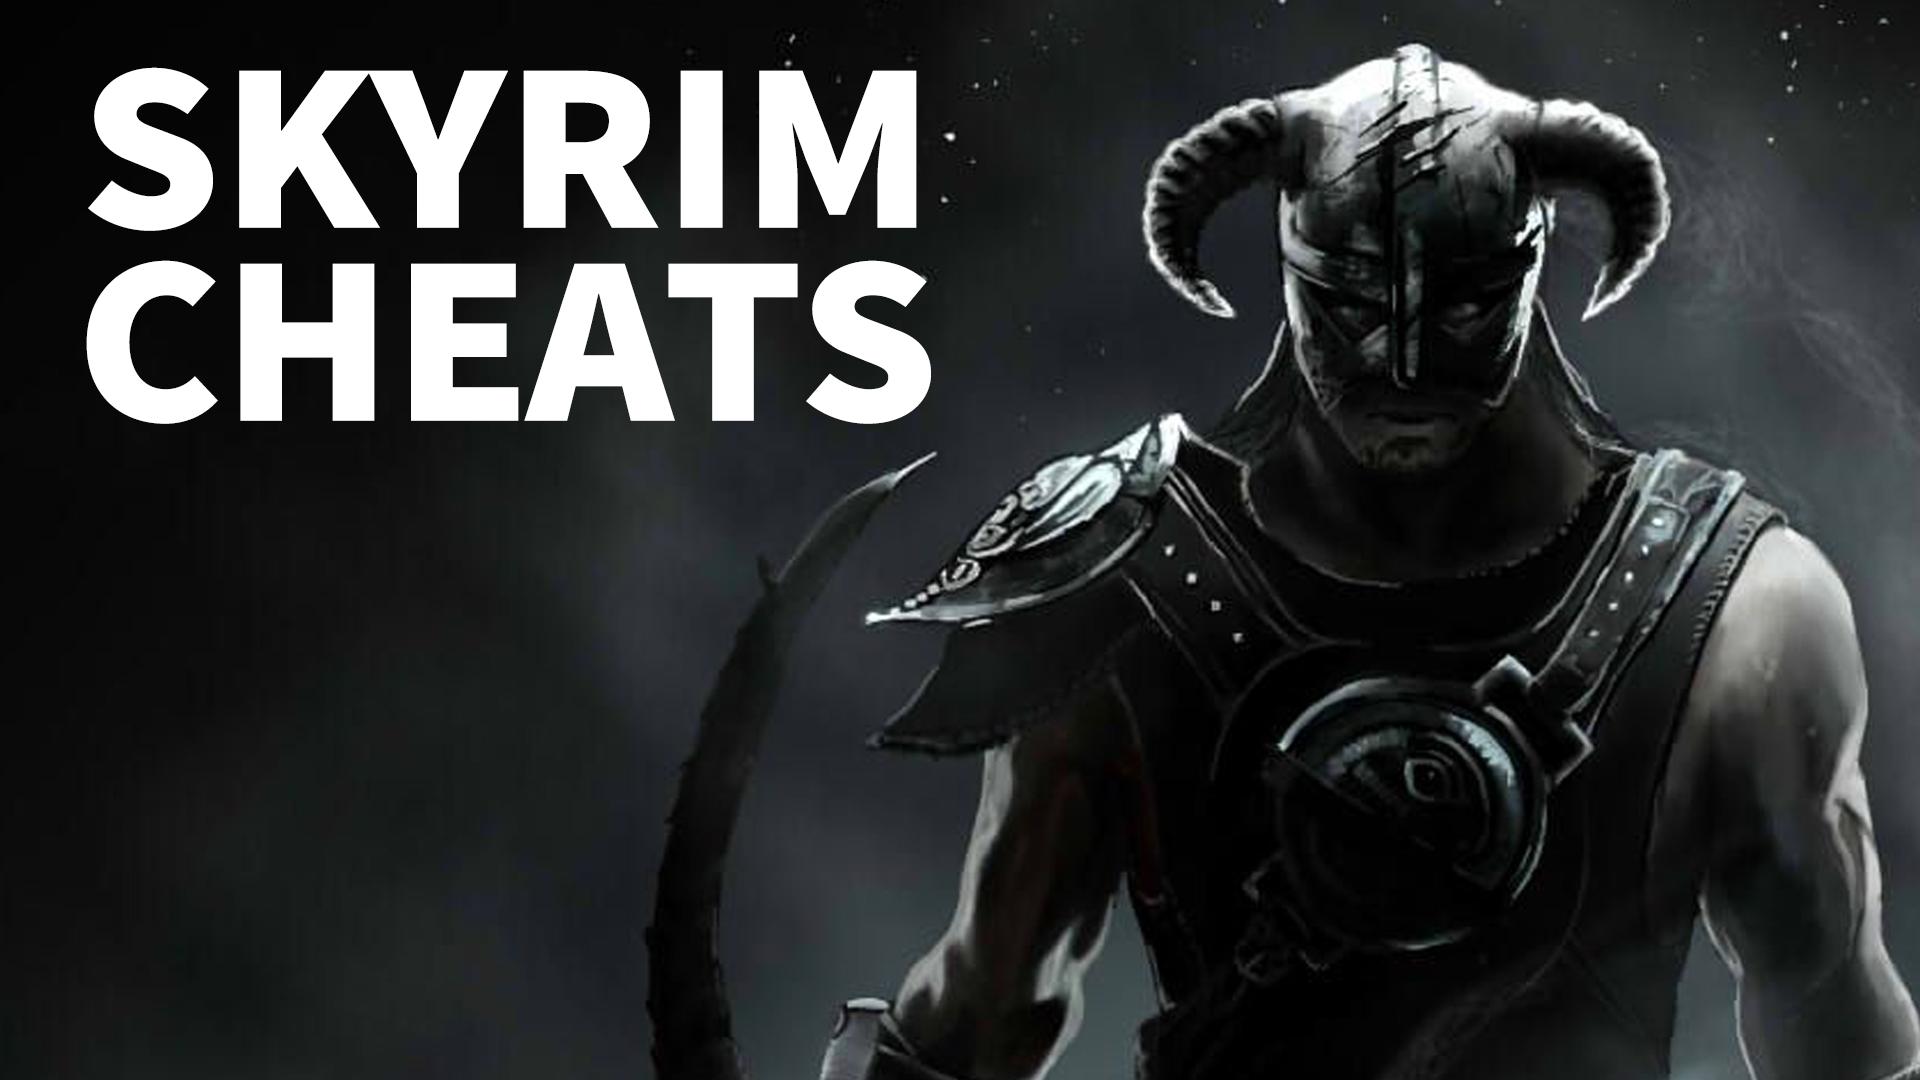 Cheats in The Elder Scrolls V: Skyrim